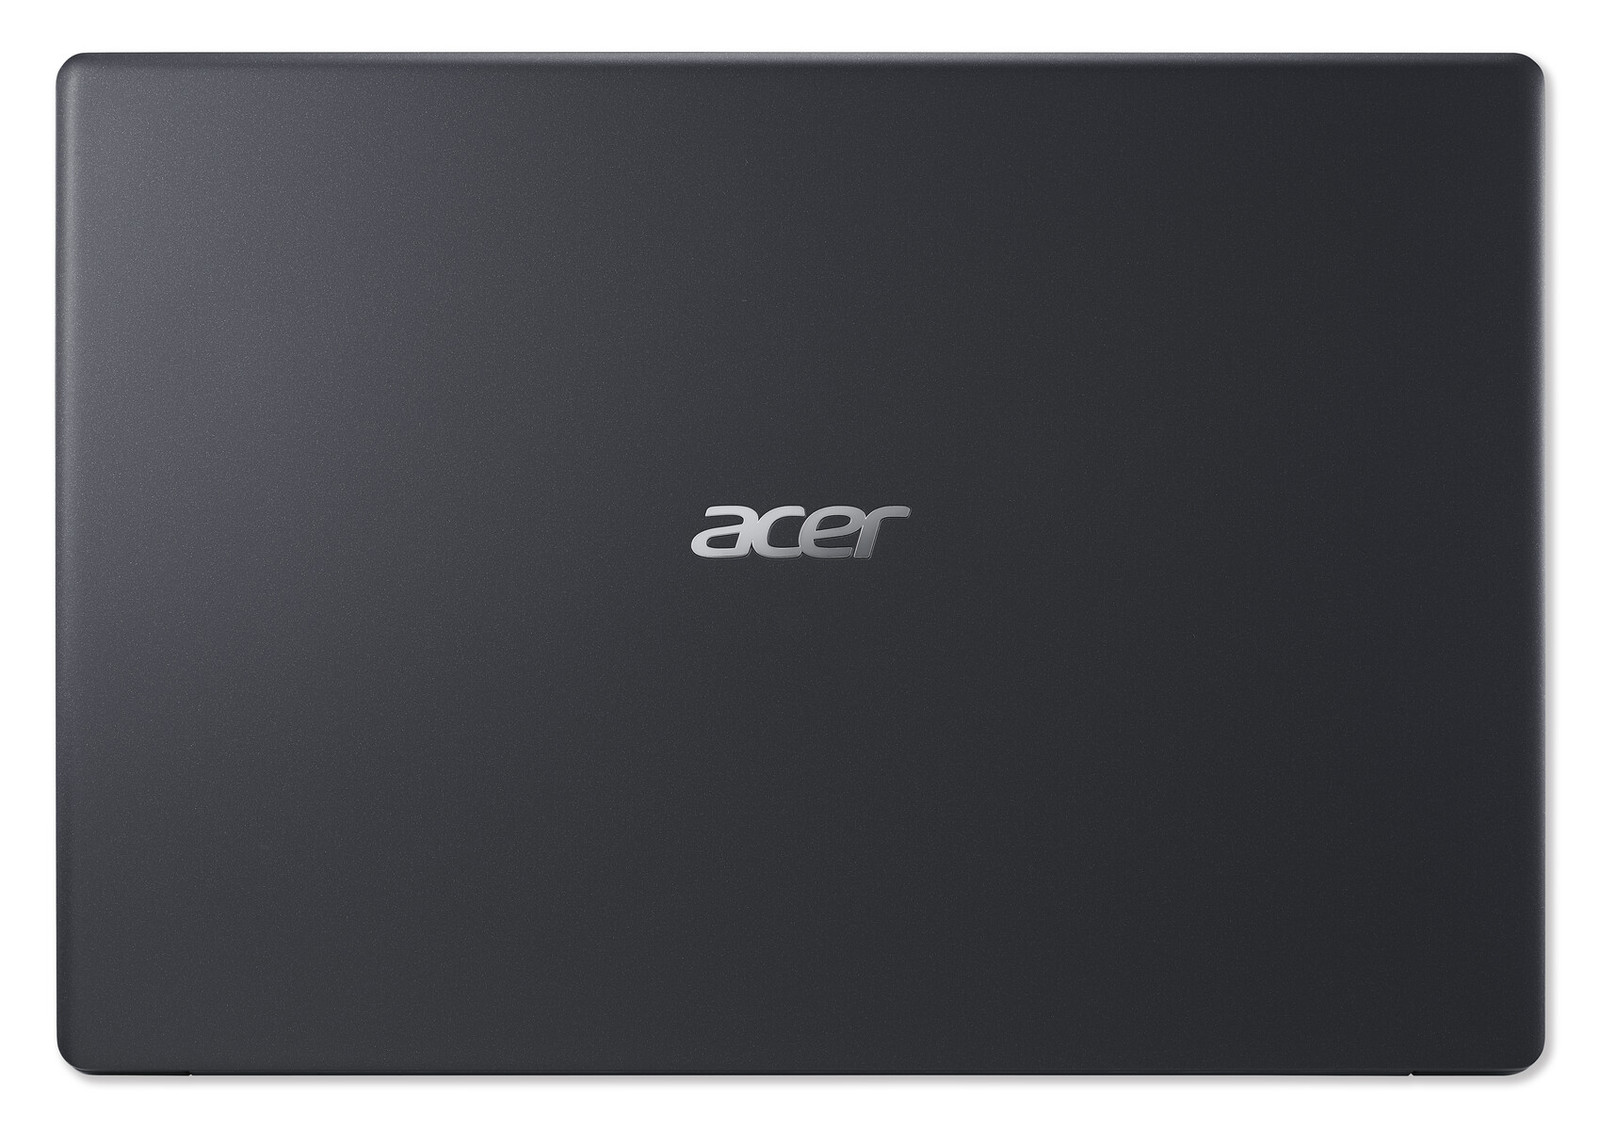 "14.0"" Acer TravelMate i5 8GB 256GB Notebook image"